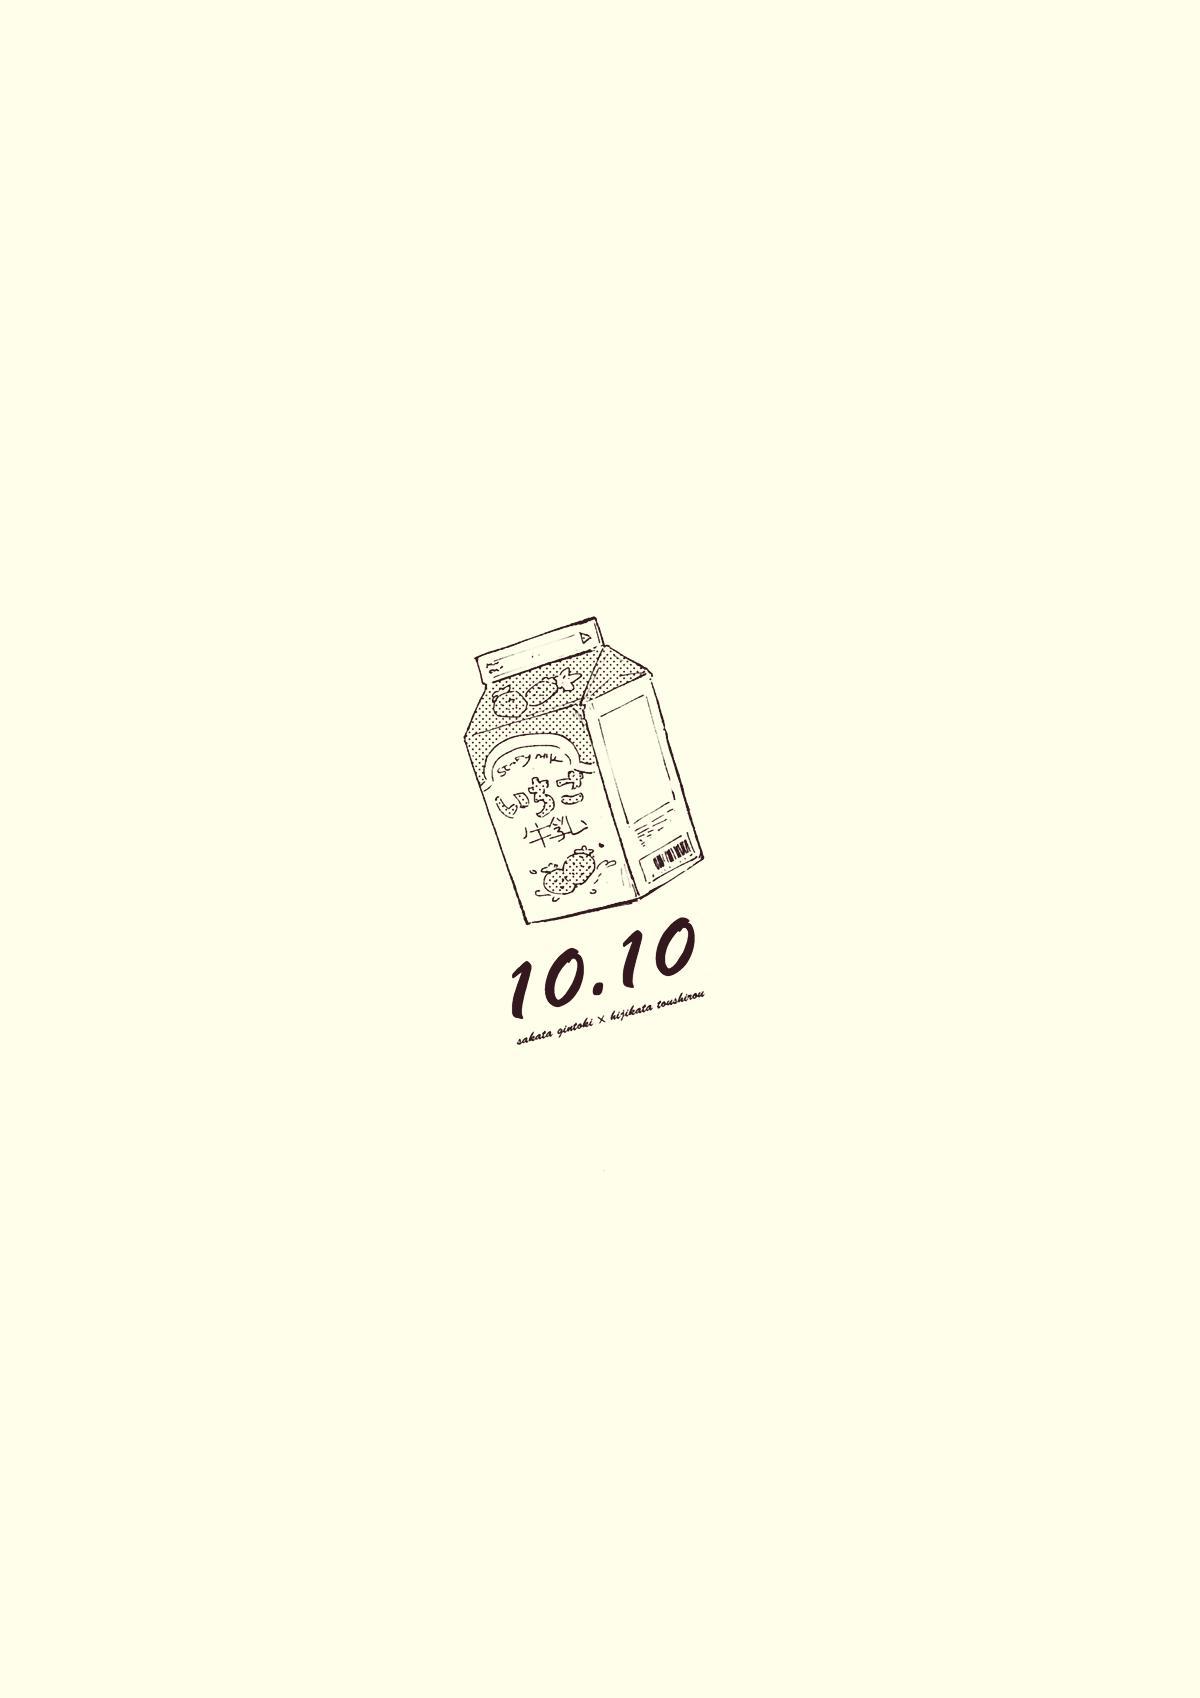 10.10 12